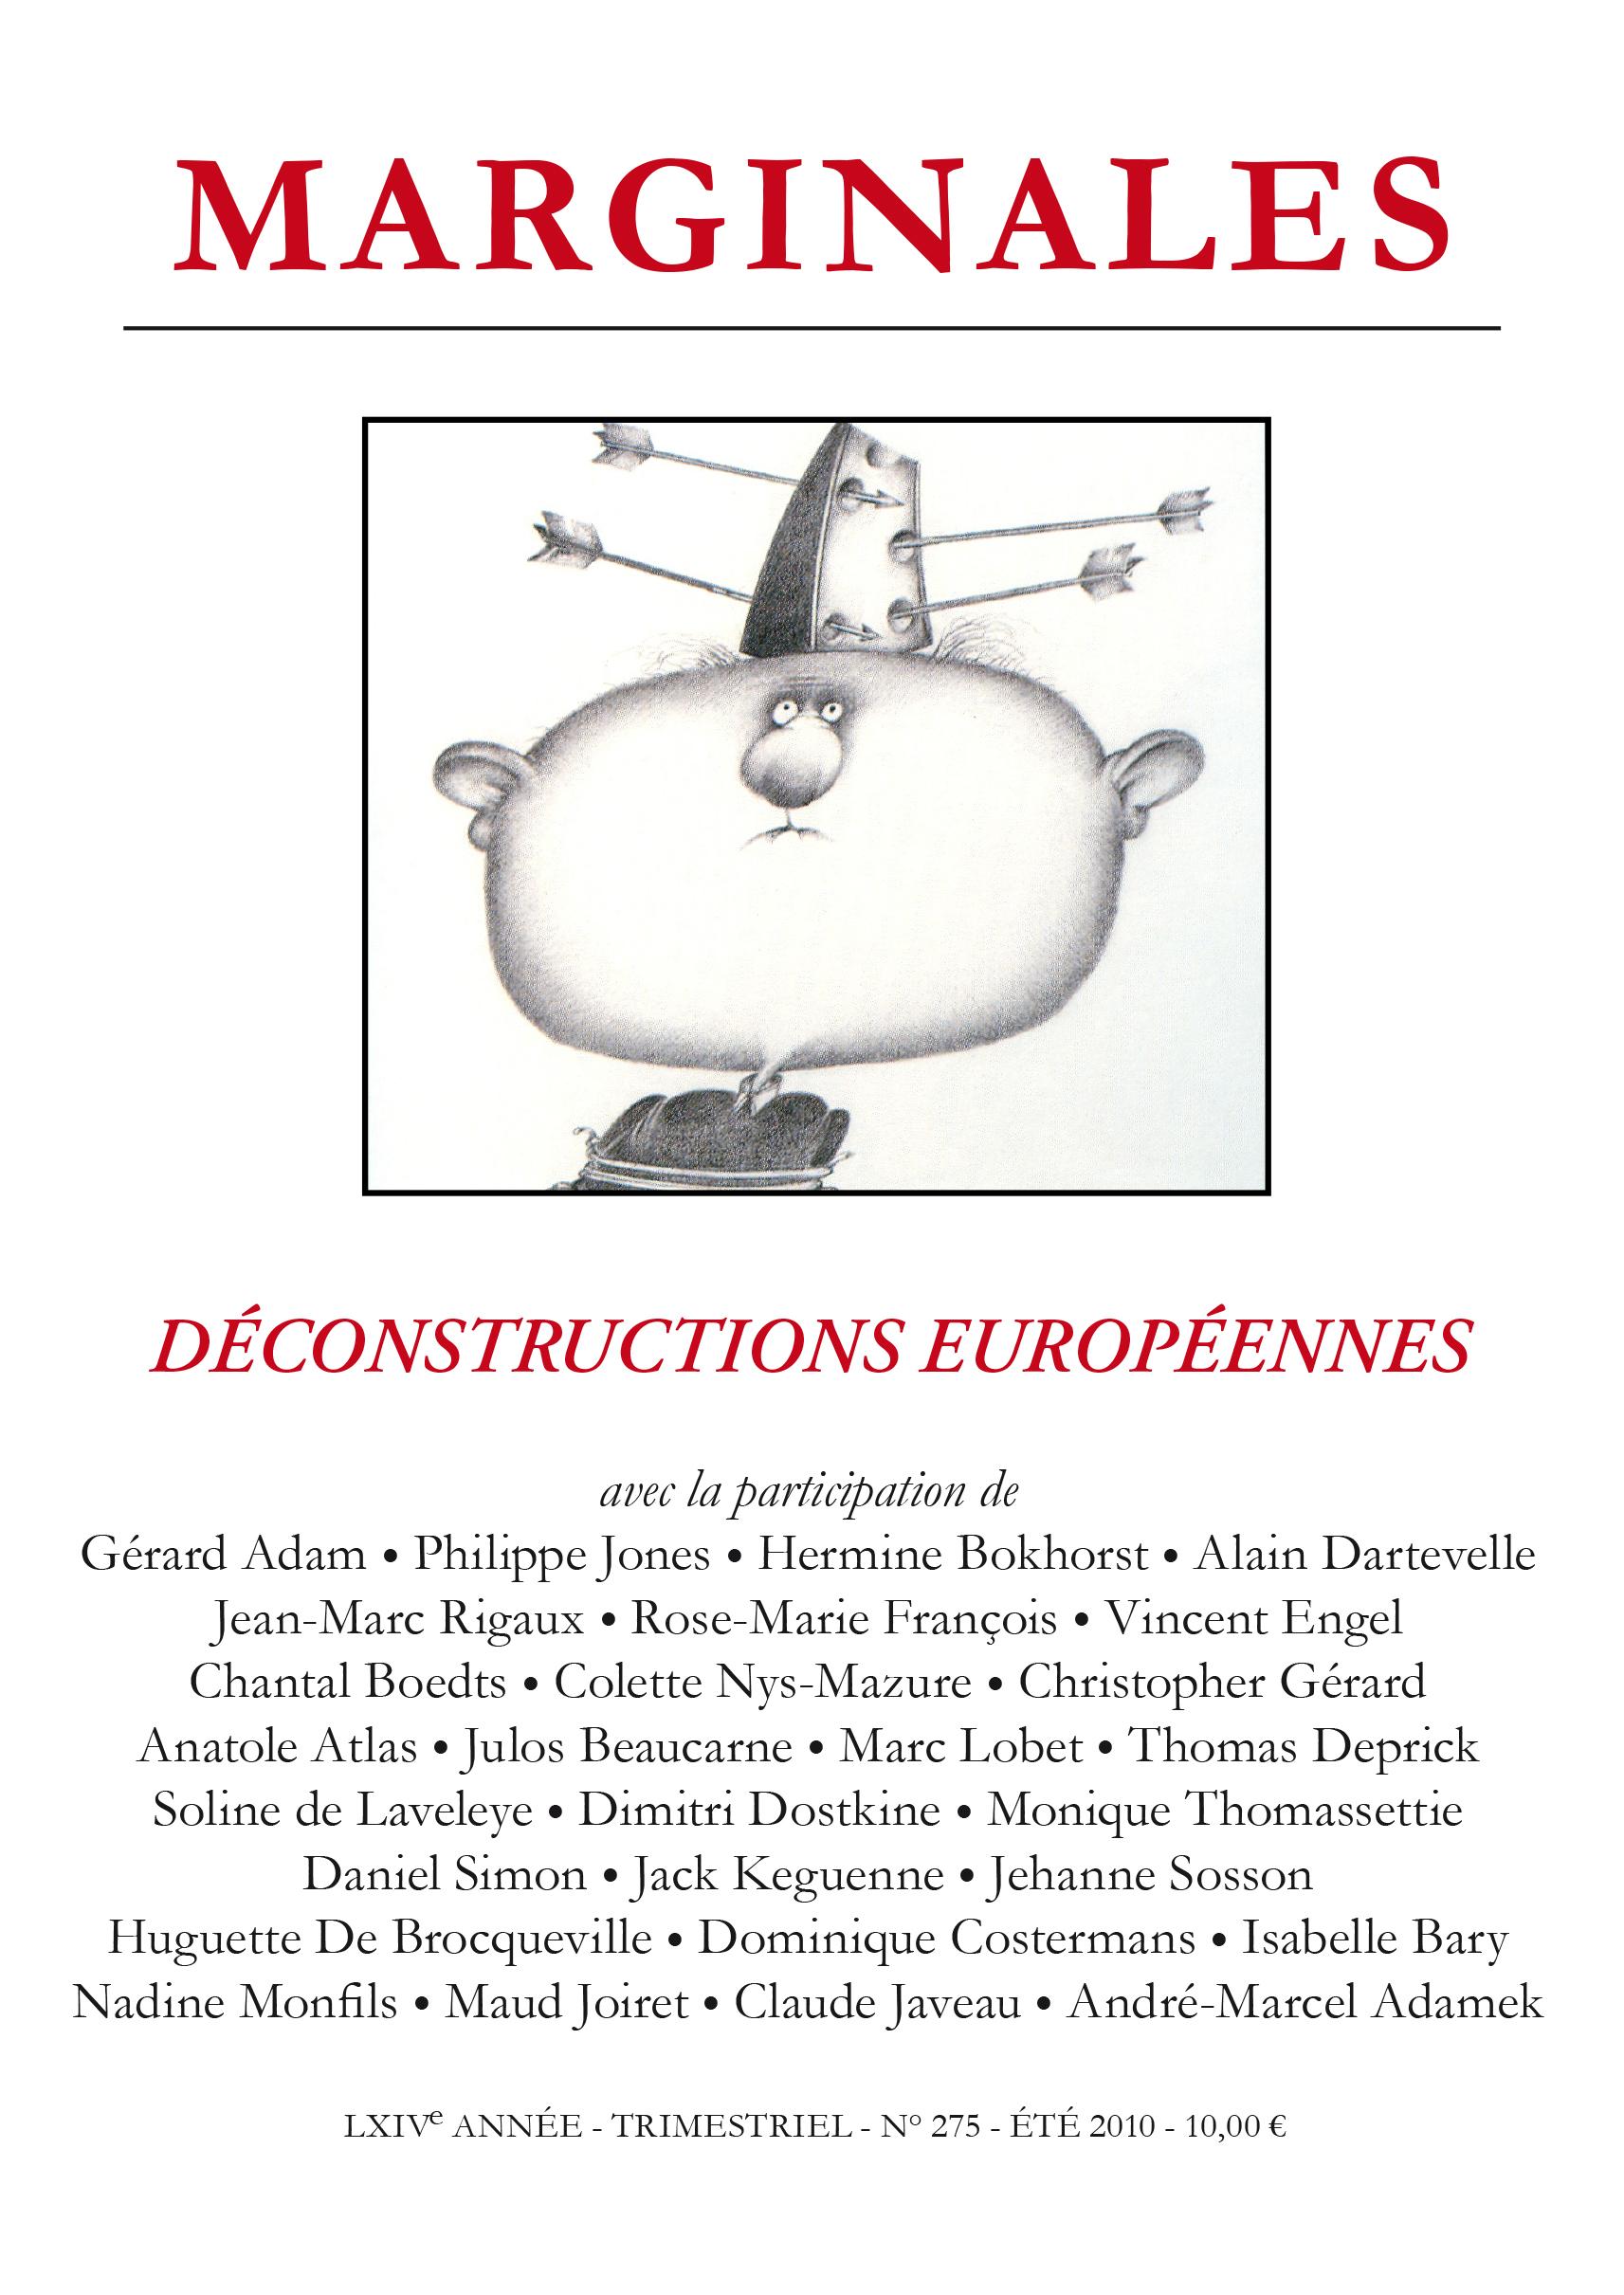 DECONSTRUCTIONS EUROPEENNES